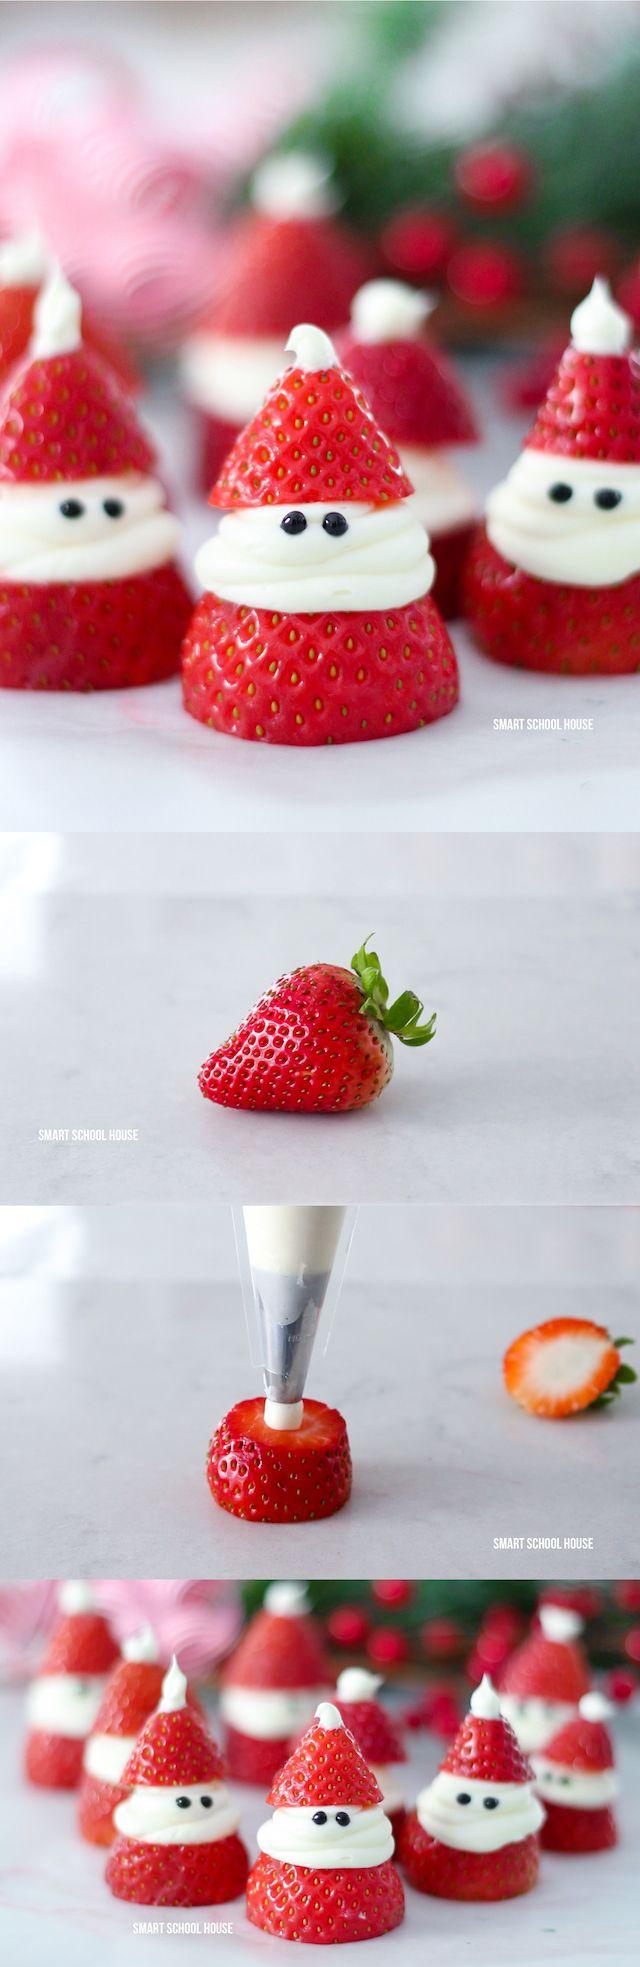 3-ingredient Strawberry Santas for Christmas! ADORABLE Christmas treat idea recipe